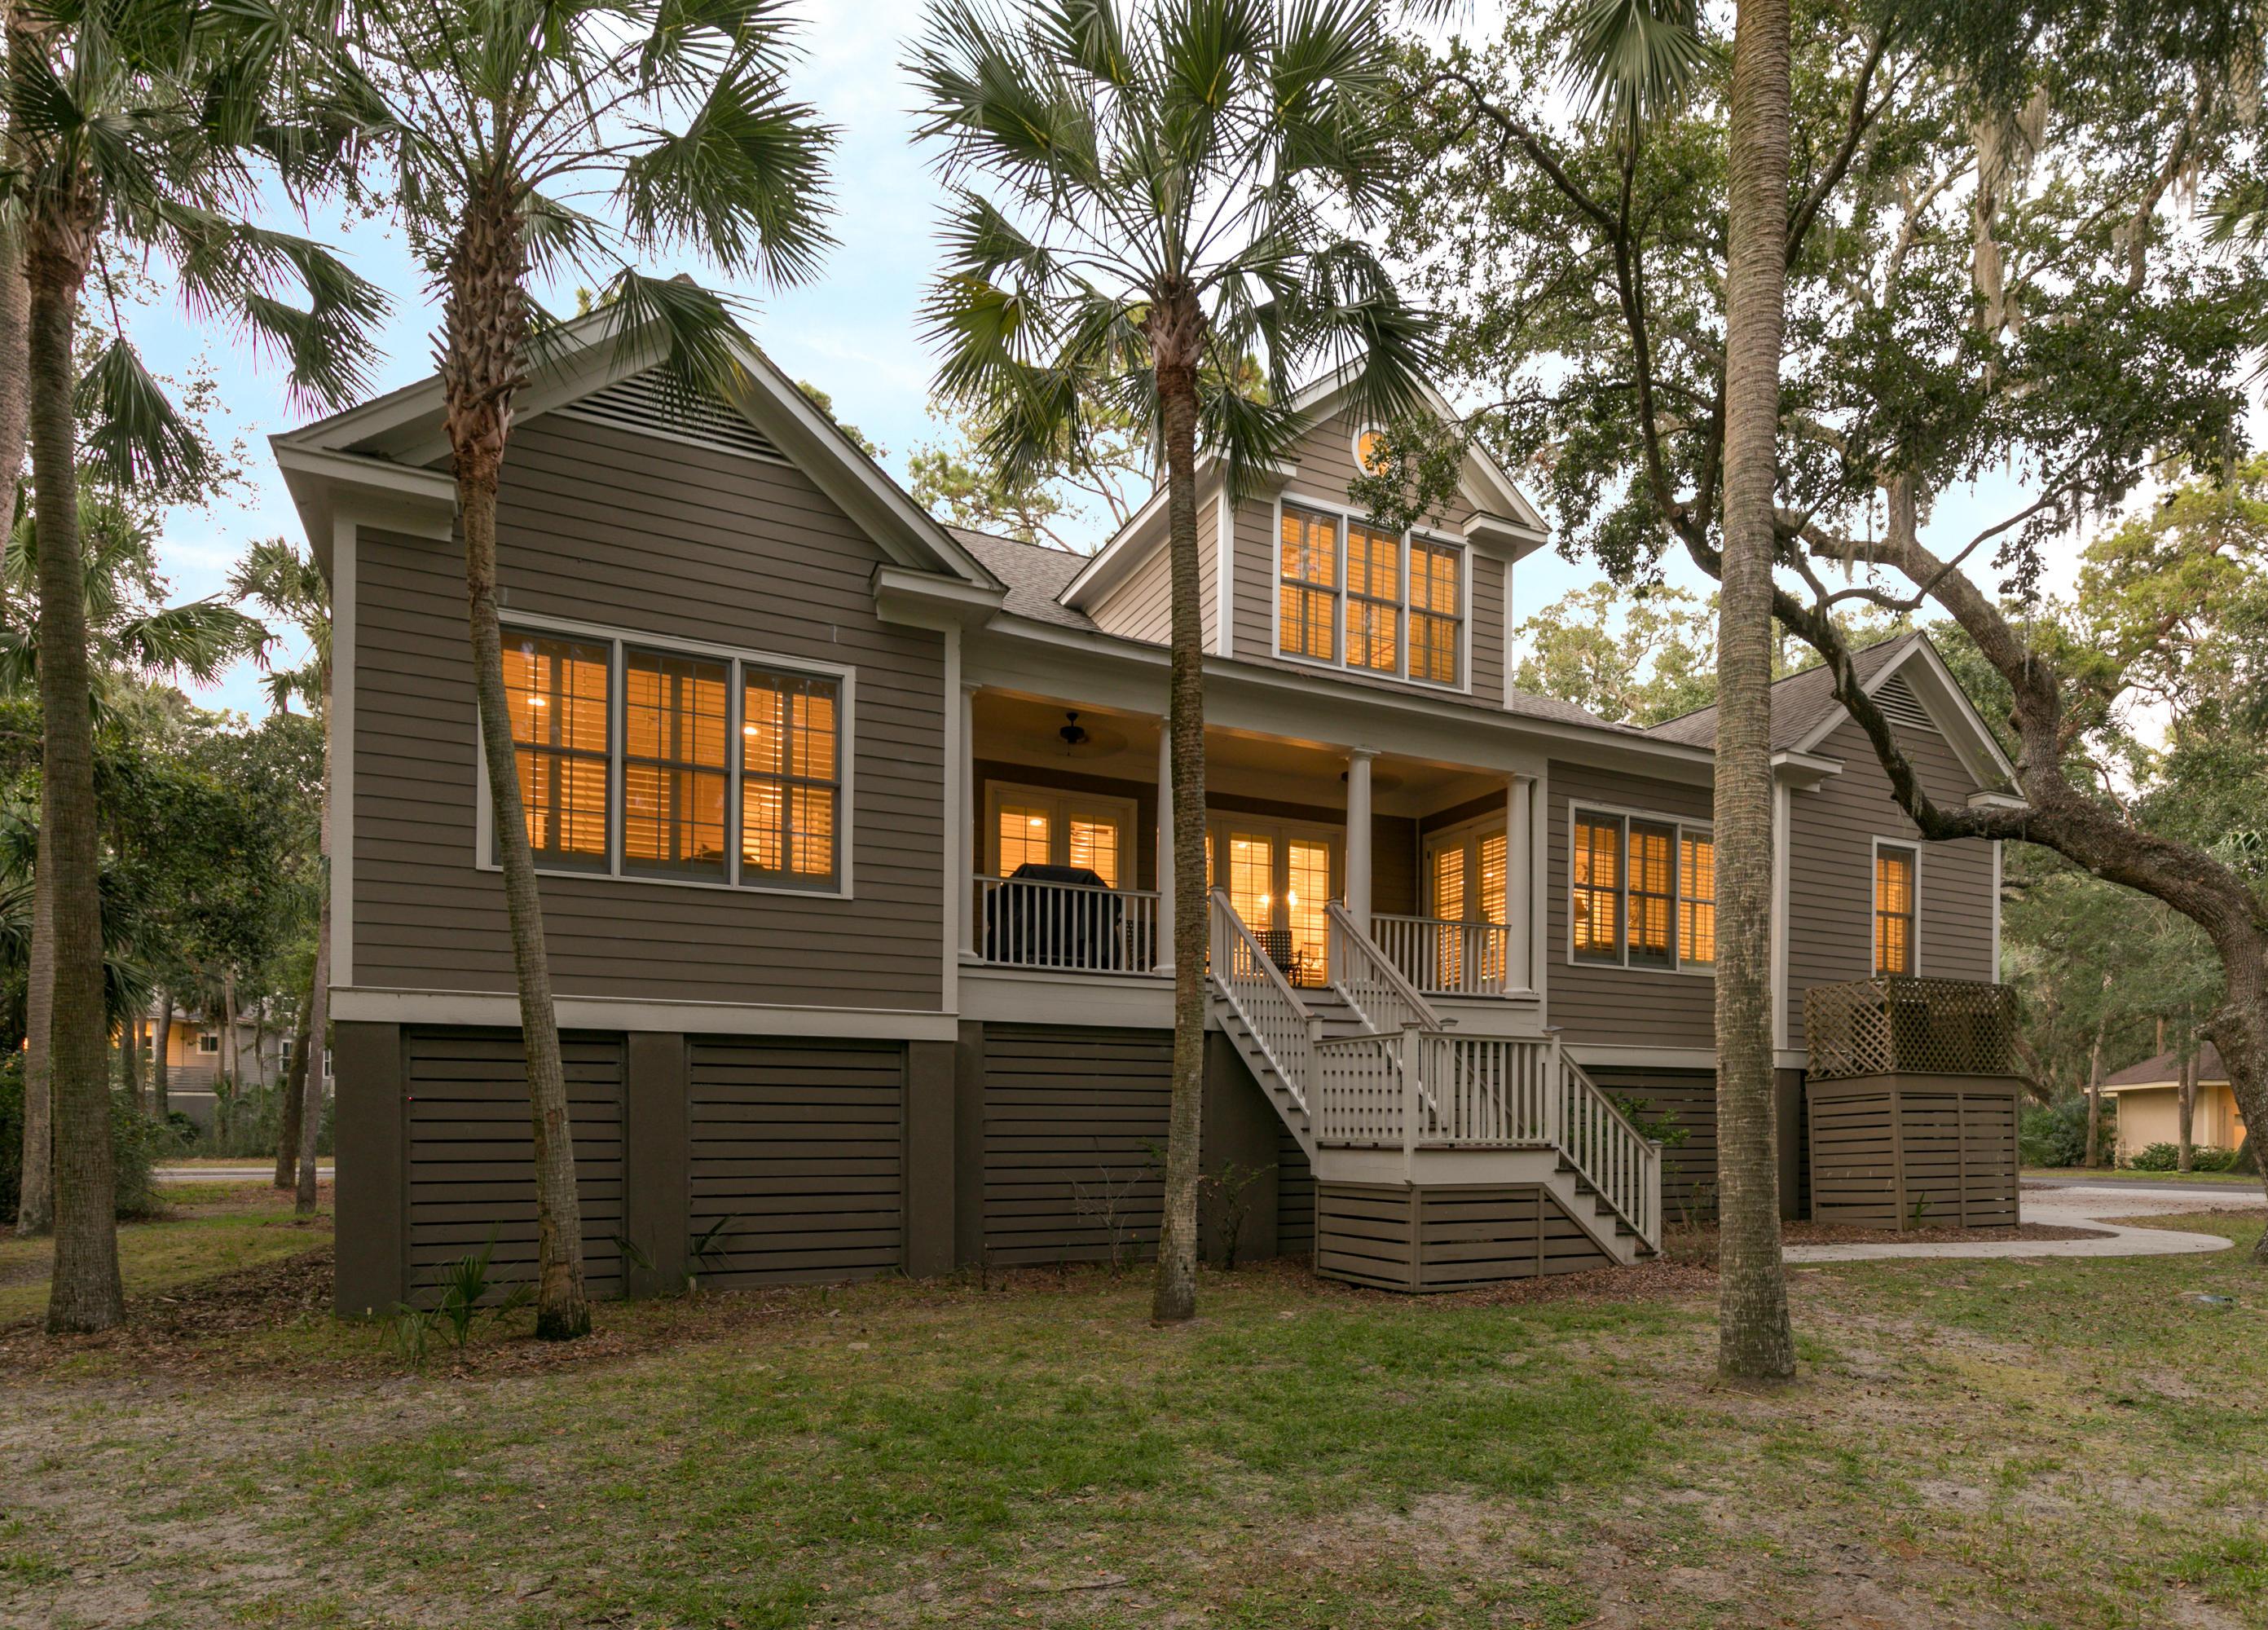 Seabrook Island Homes For Sale - 2701 Seabrook Island, Seabrook Island, SC - 11